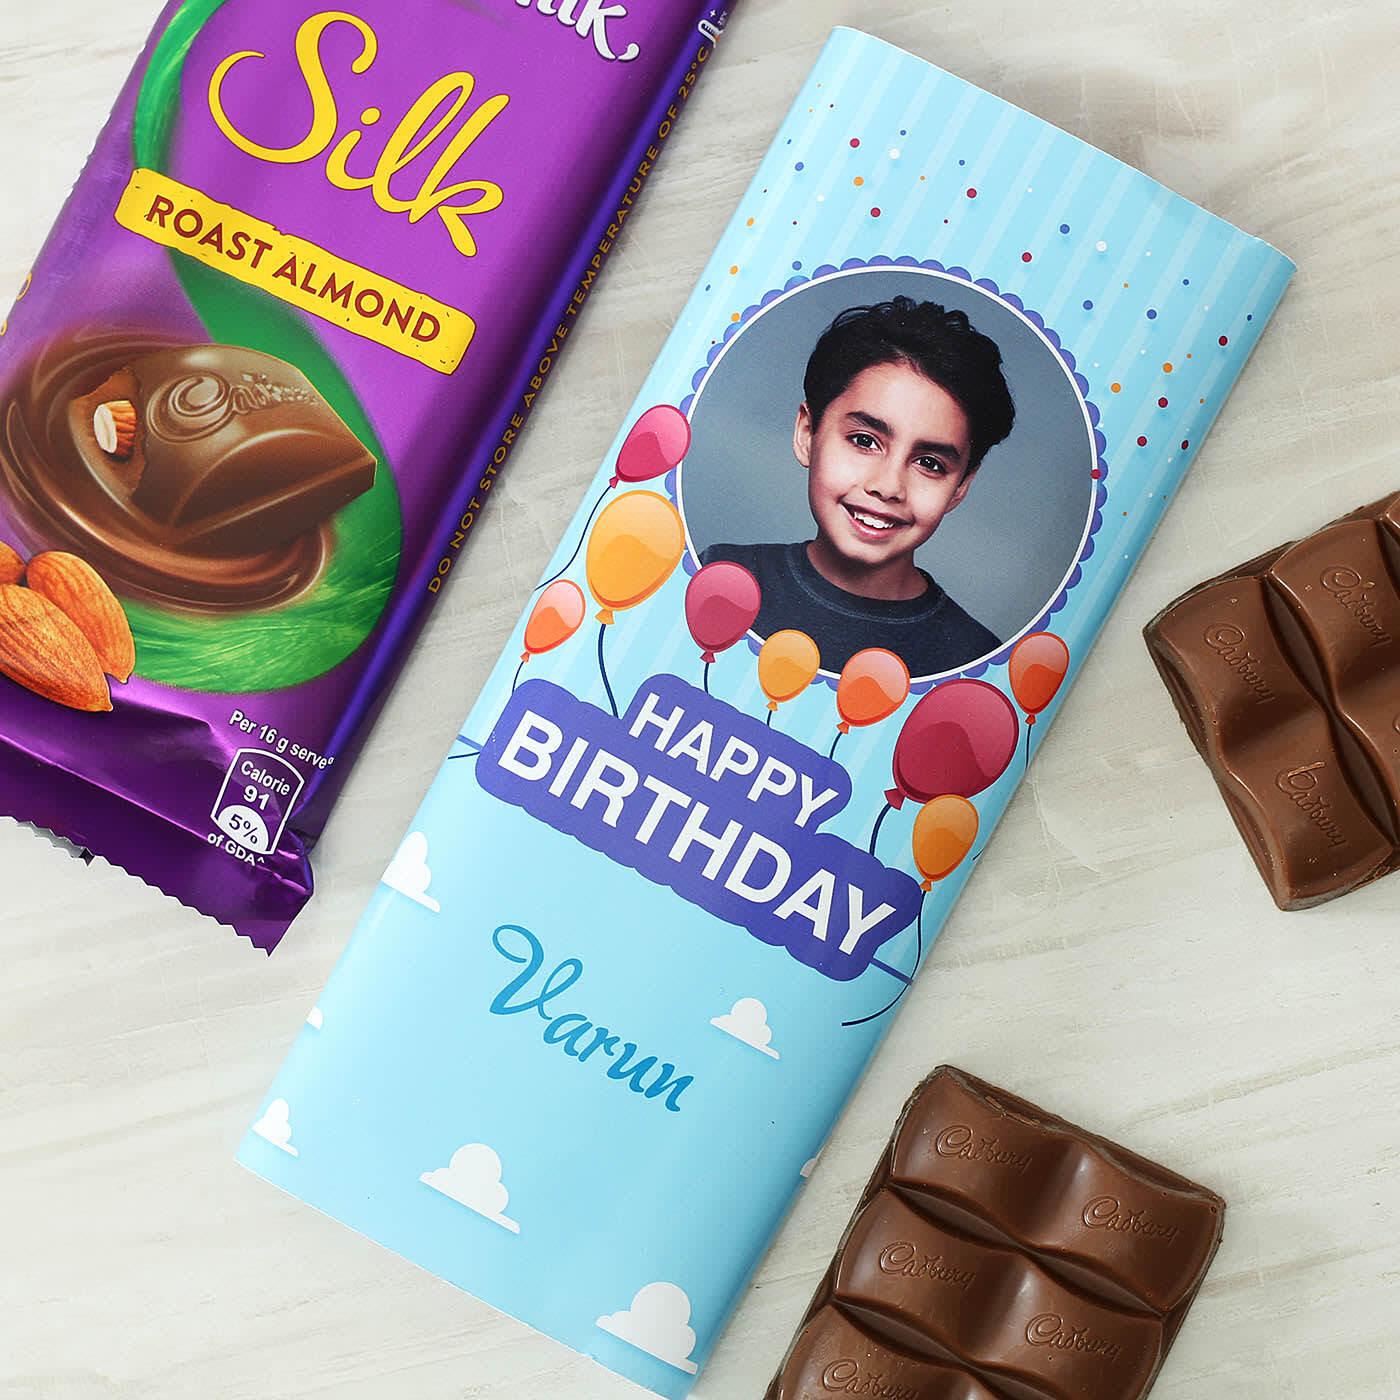 Cadbury Dairy Milk Silk Bar in Personalized Wrapper